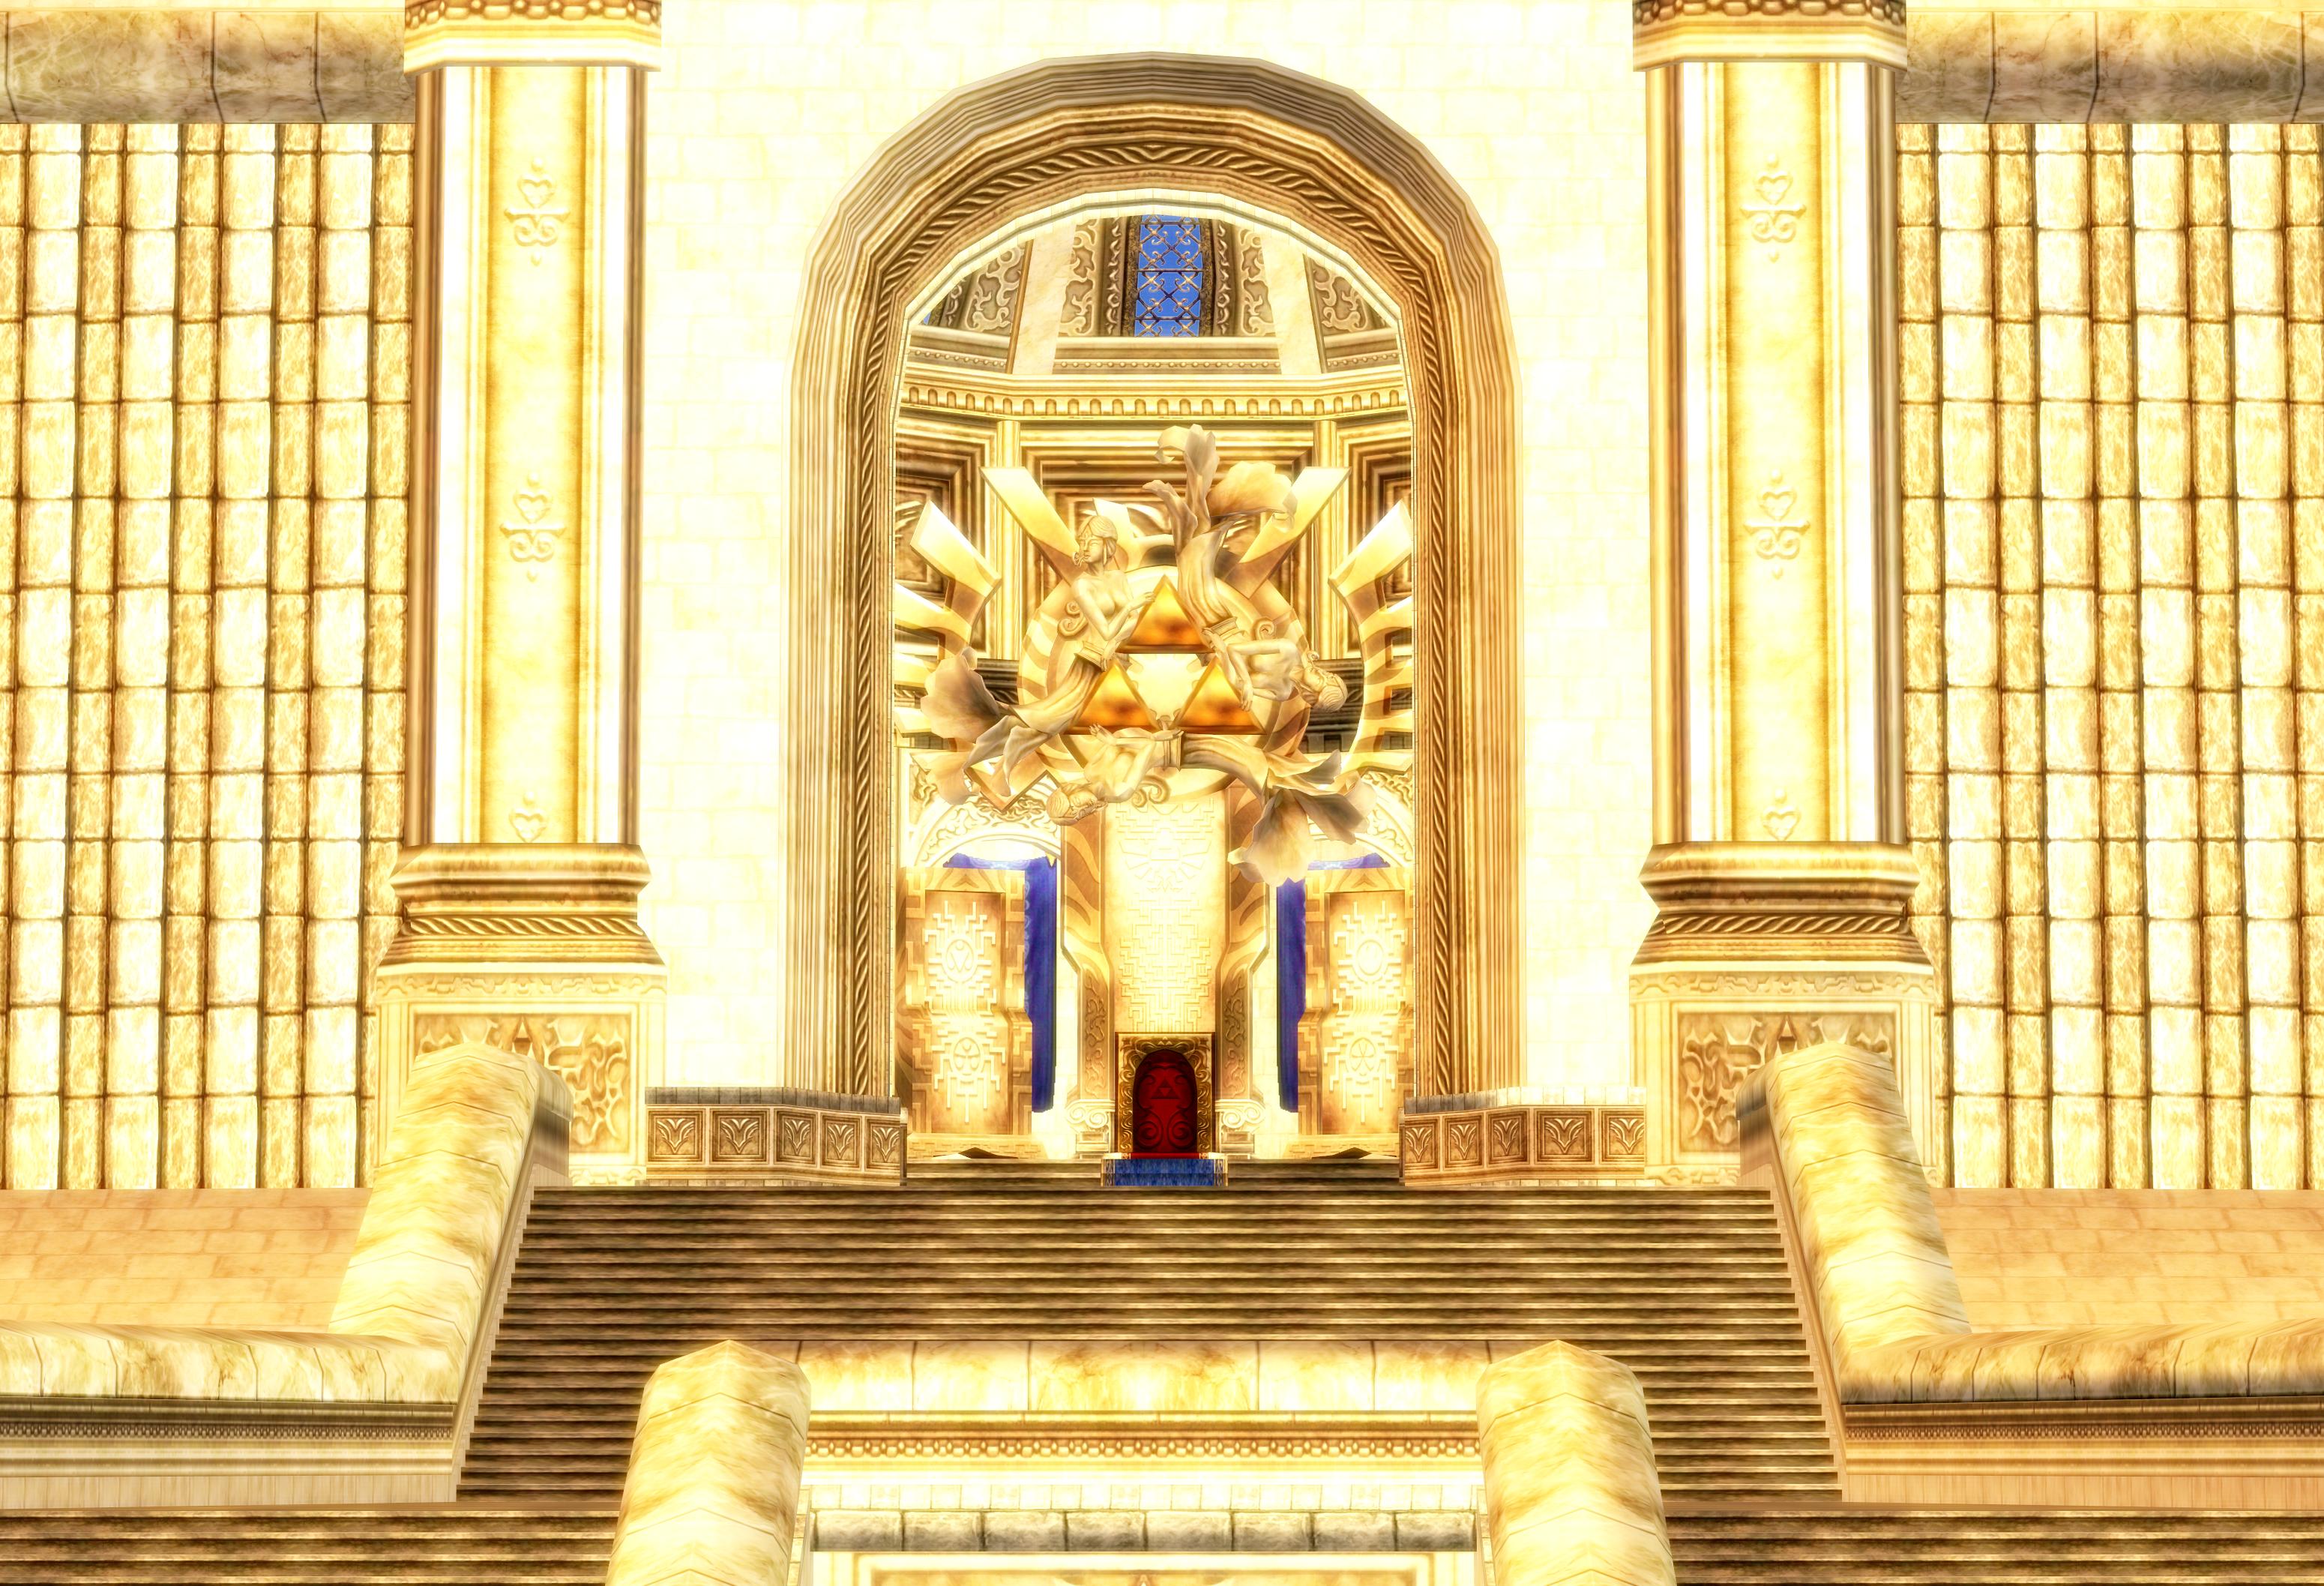 Hyrule Castle Throne Twilight Princess By Hakirya On Deviantart